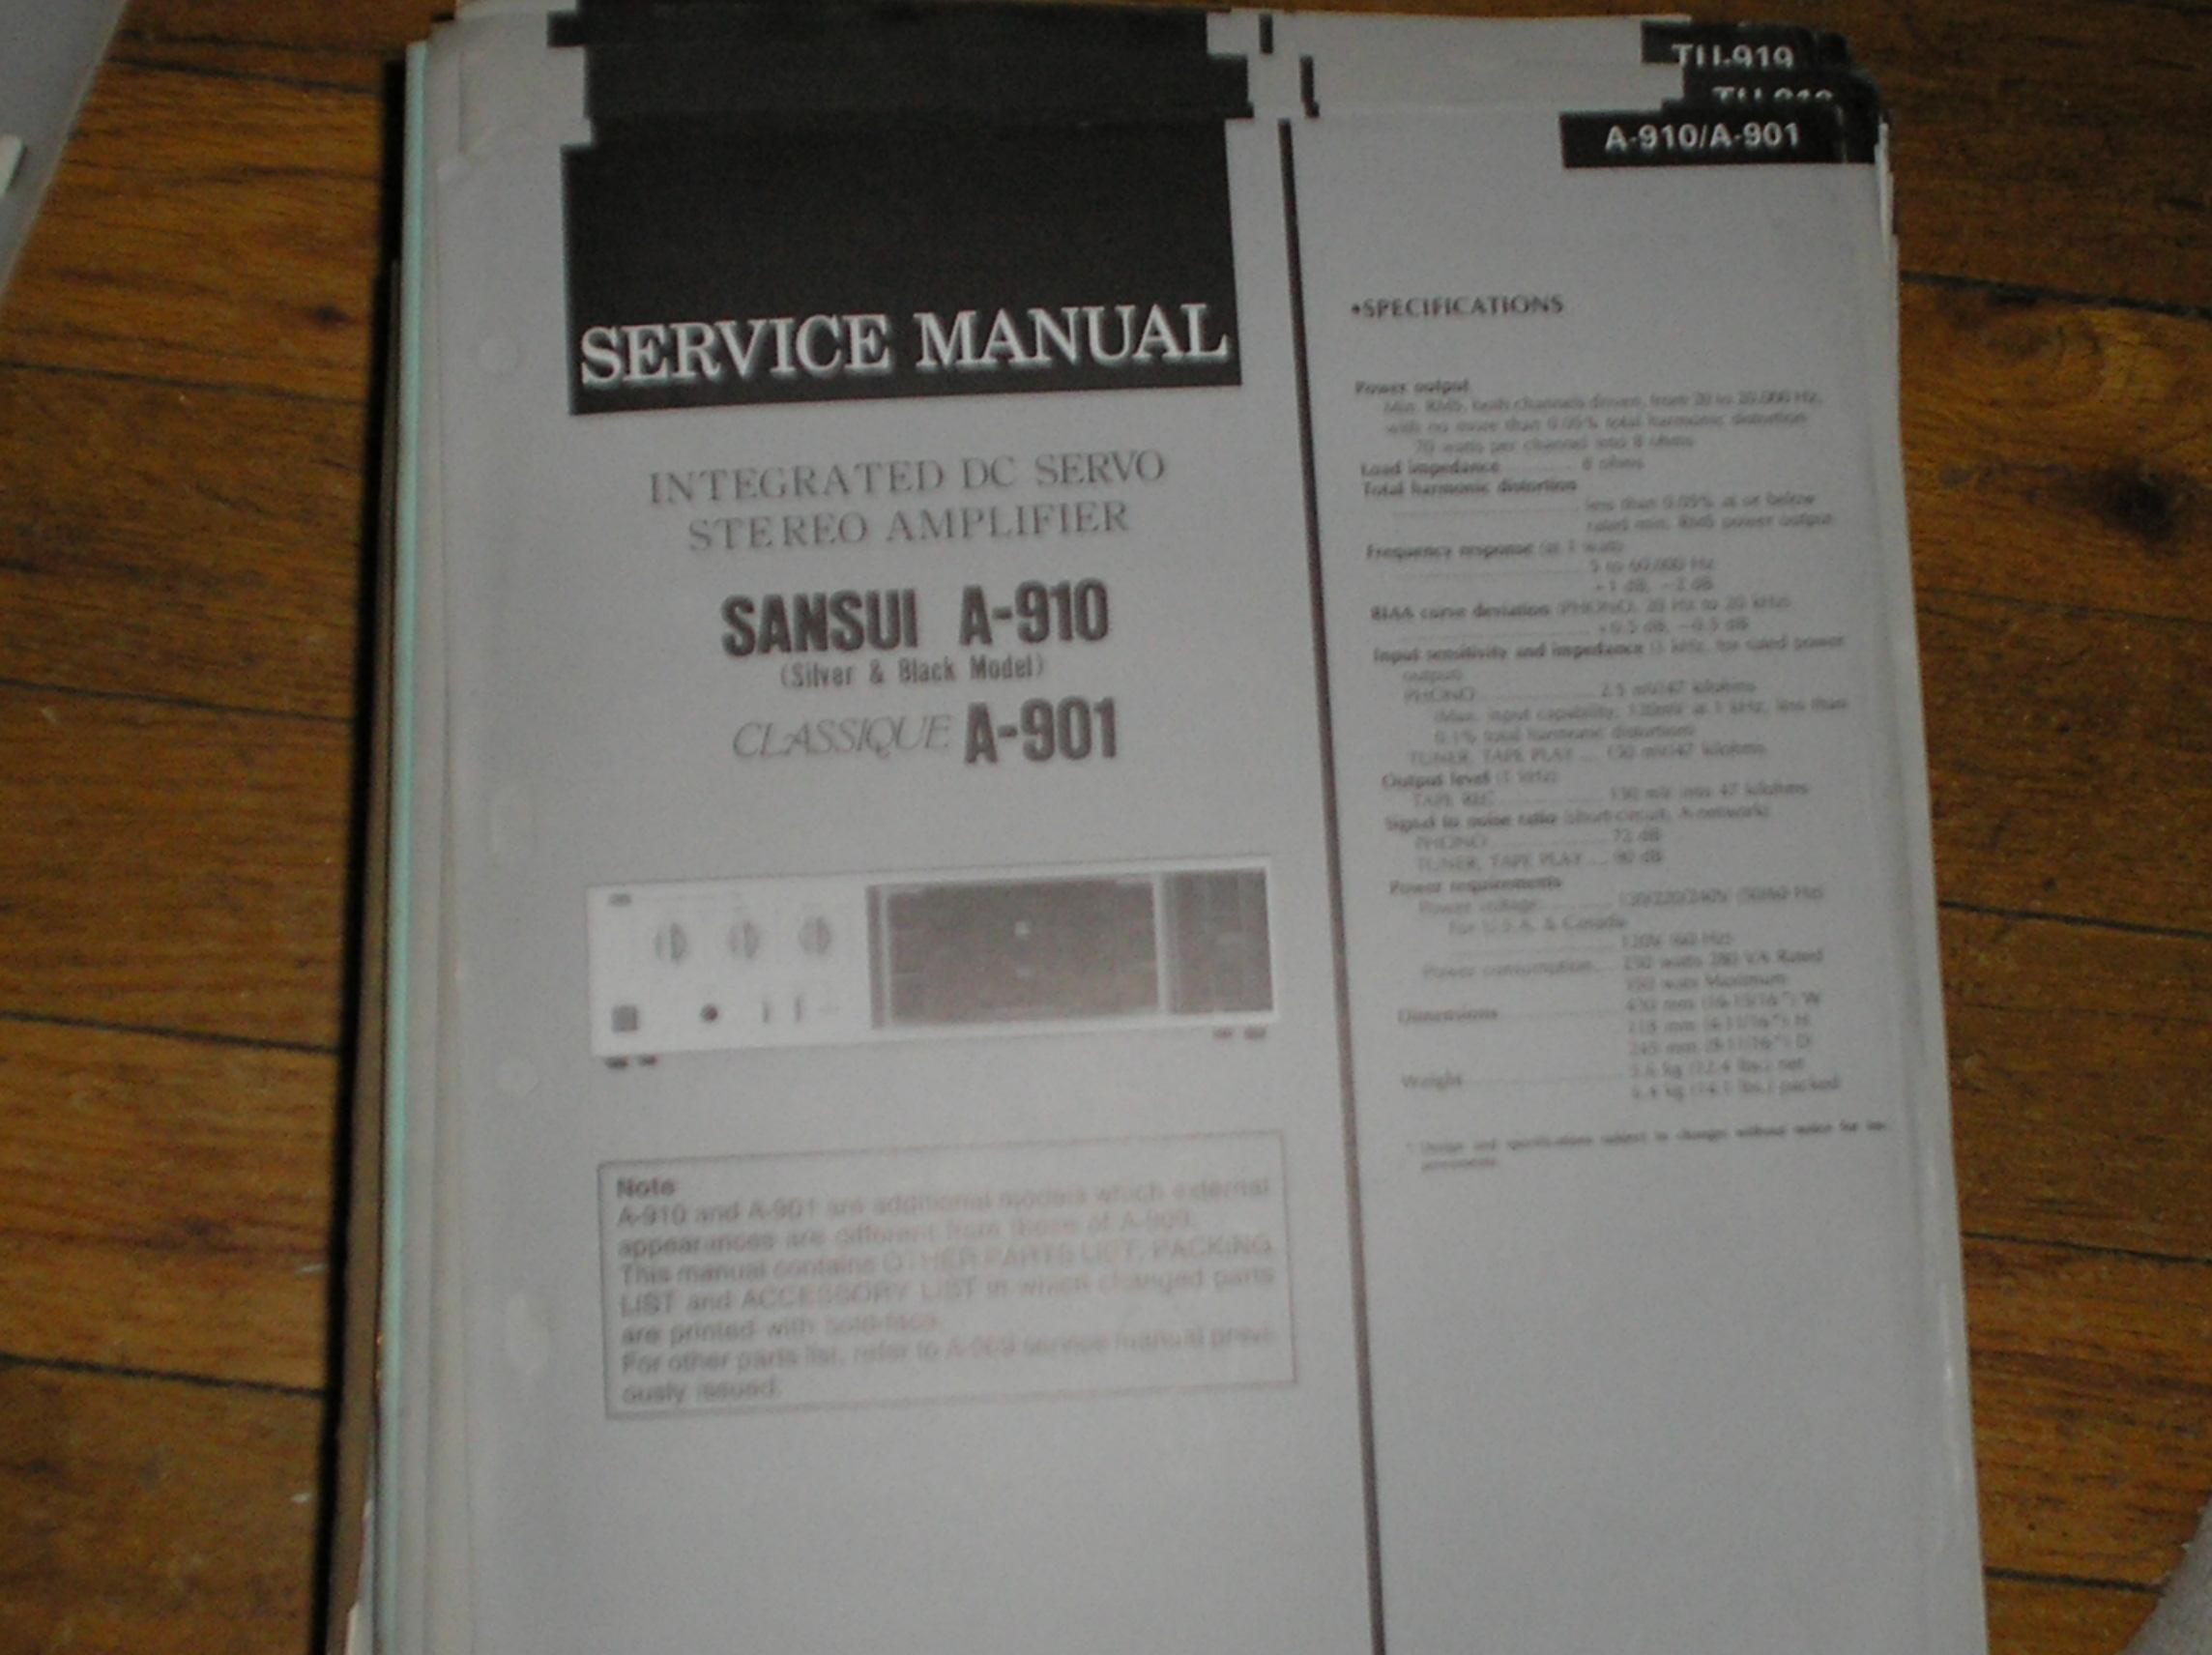 A-910 A-901 Classique Amplifier Service Manual